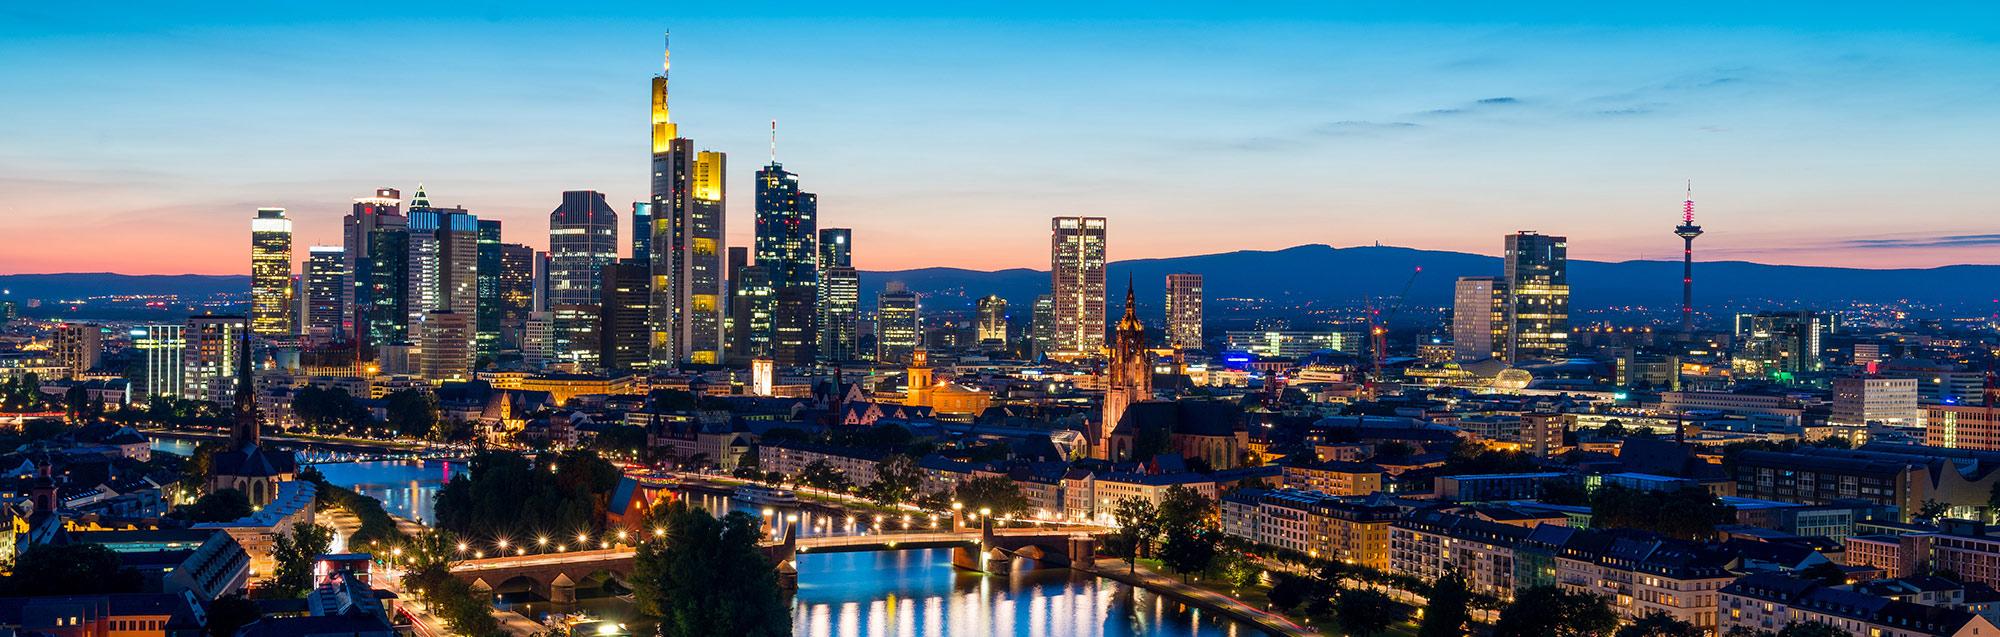 Vacanze studio a Francoforte